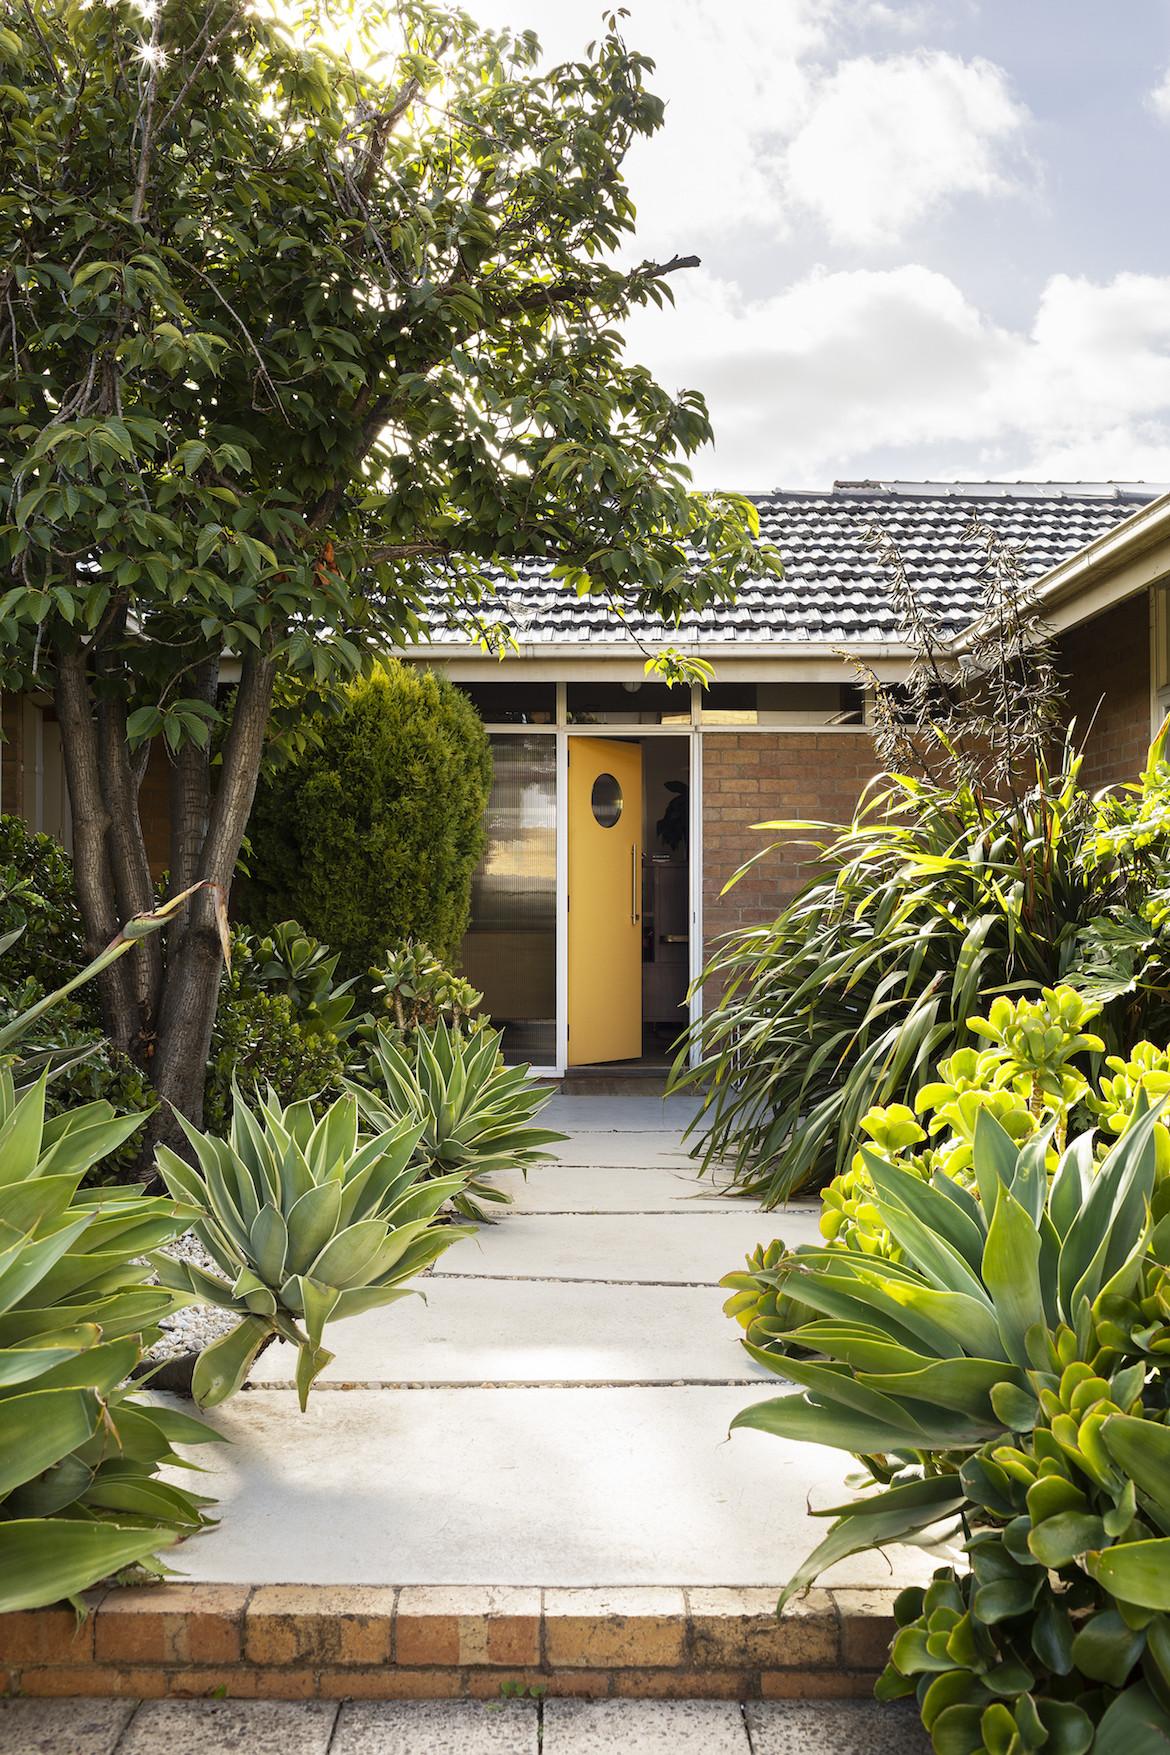 The yellow front door of the brick home stands slightly ajar.